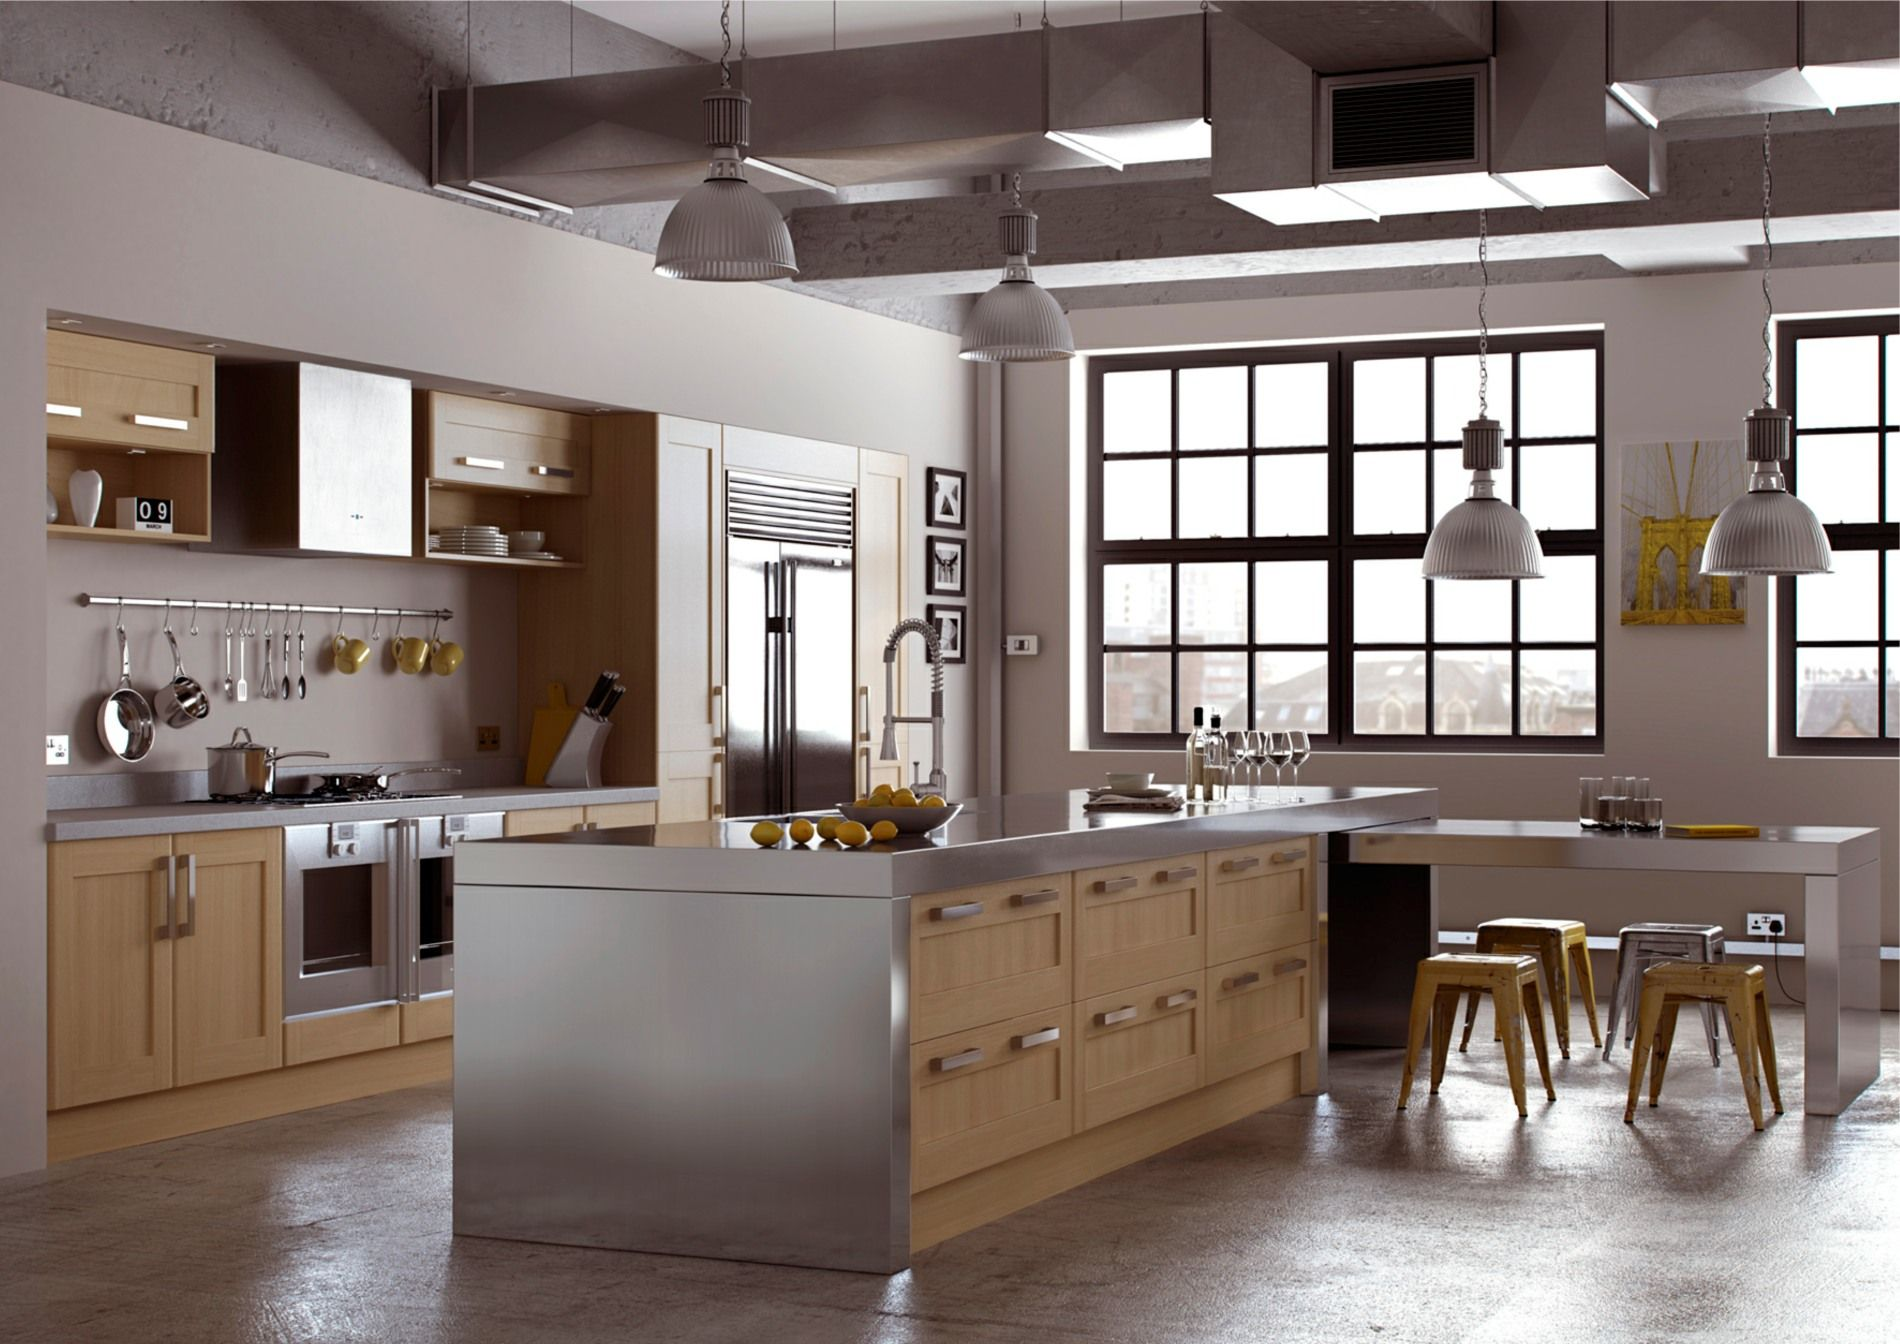 Ohio Oak Mastercraft Kitchens Contemporary Kitchen Kitchen Design Complete Kitchens